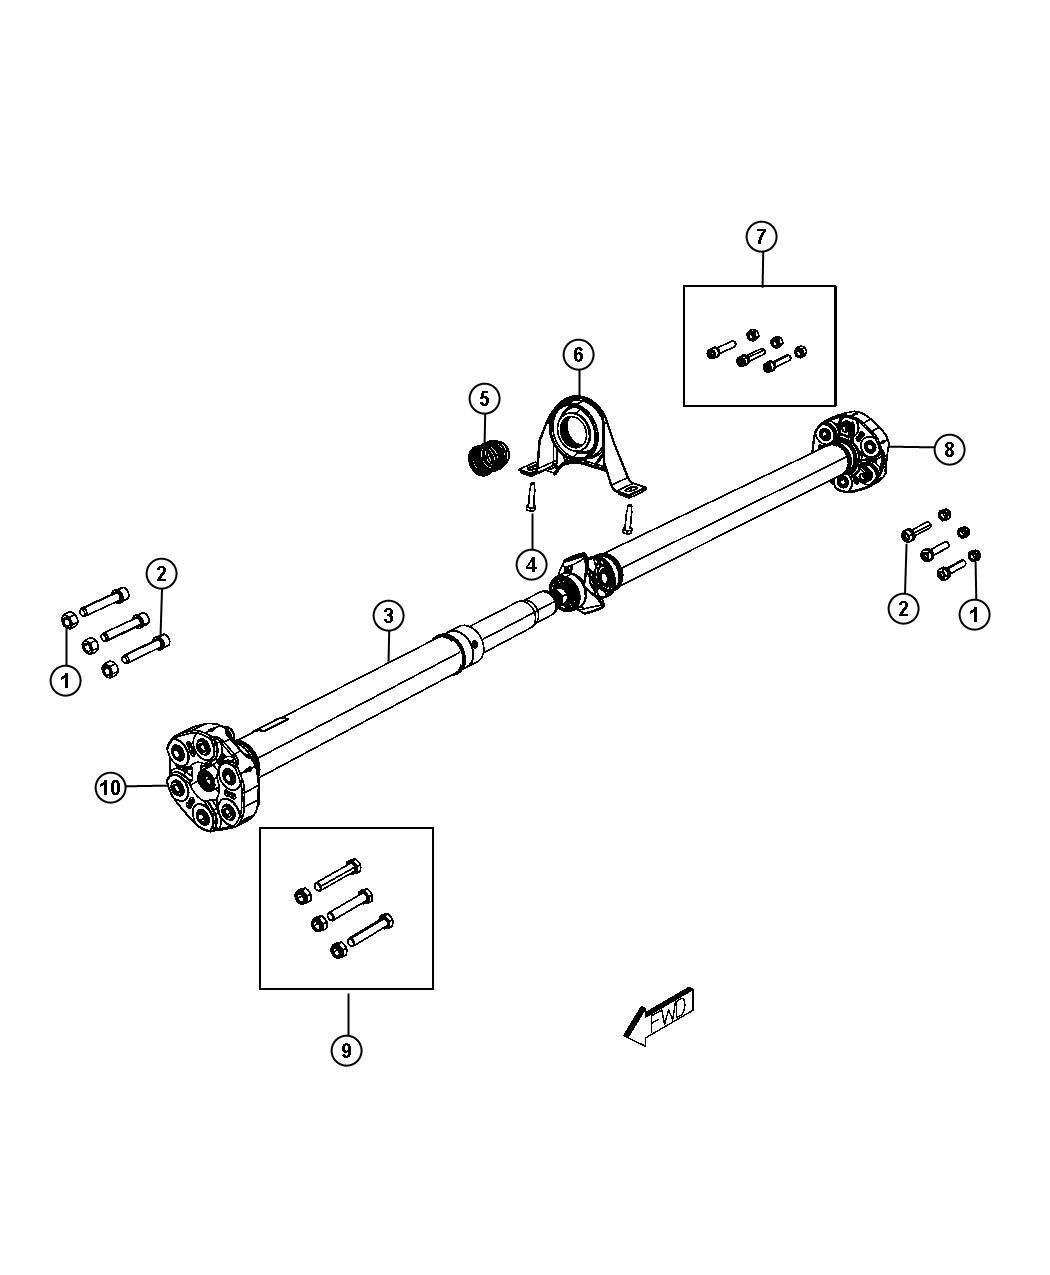 Dodge Charger Bolt Kit Mounting